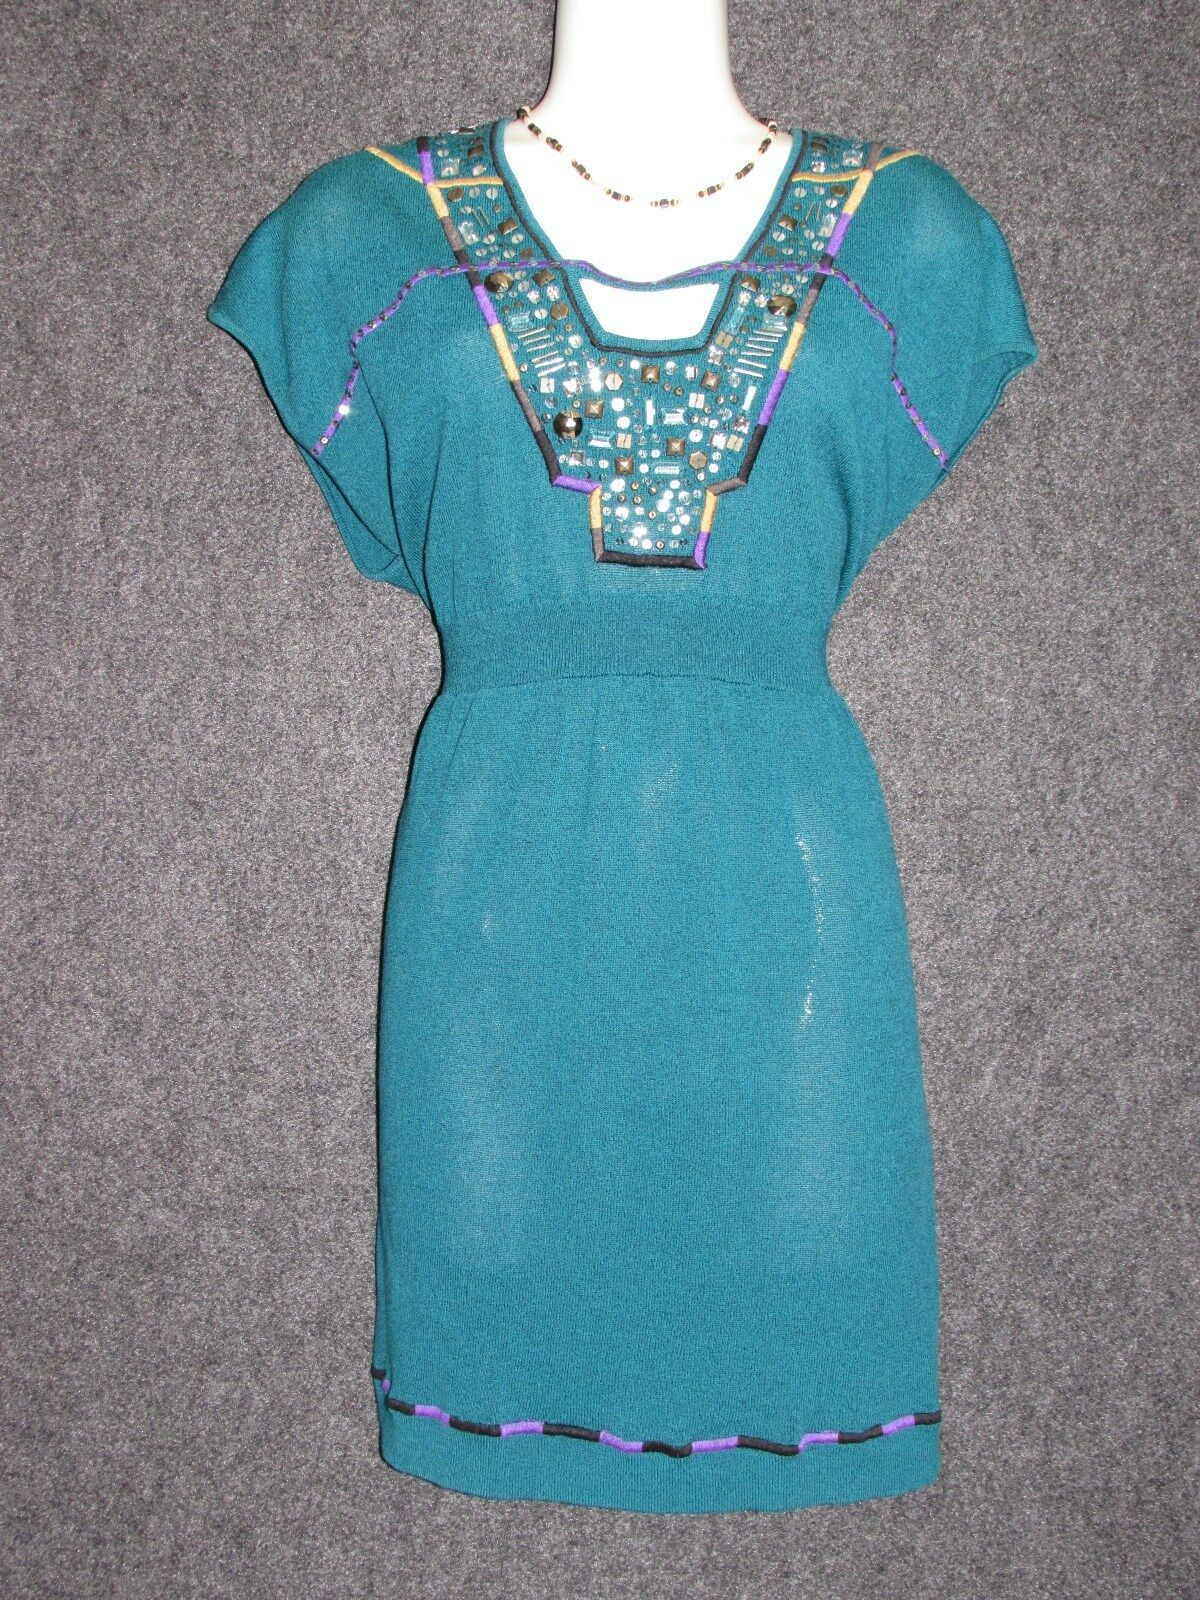 NANETTE LEPORE Turquoise w colorful Embellishment Beaded DRESS SZ L